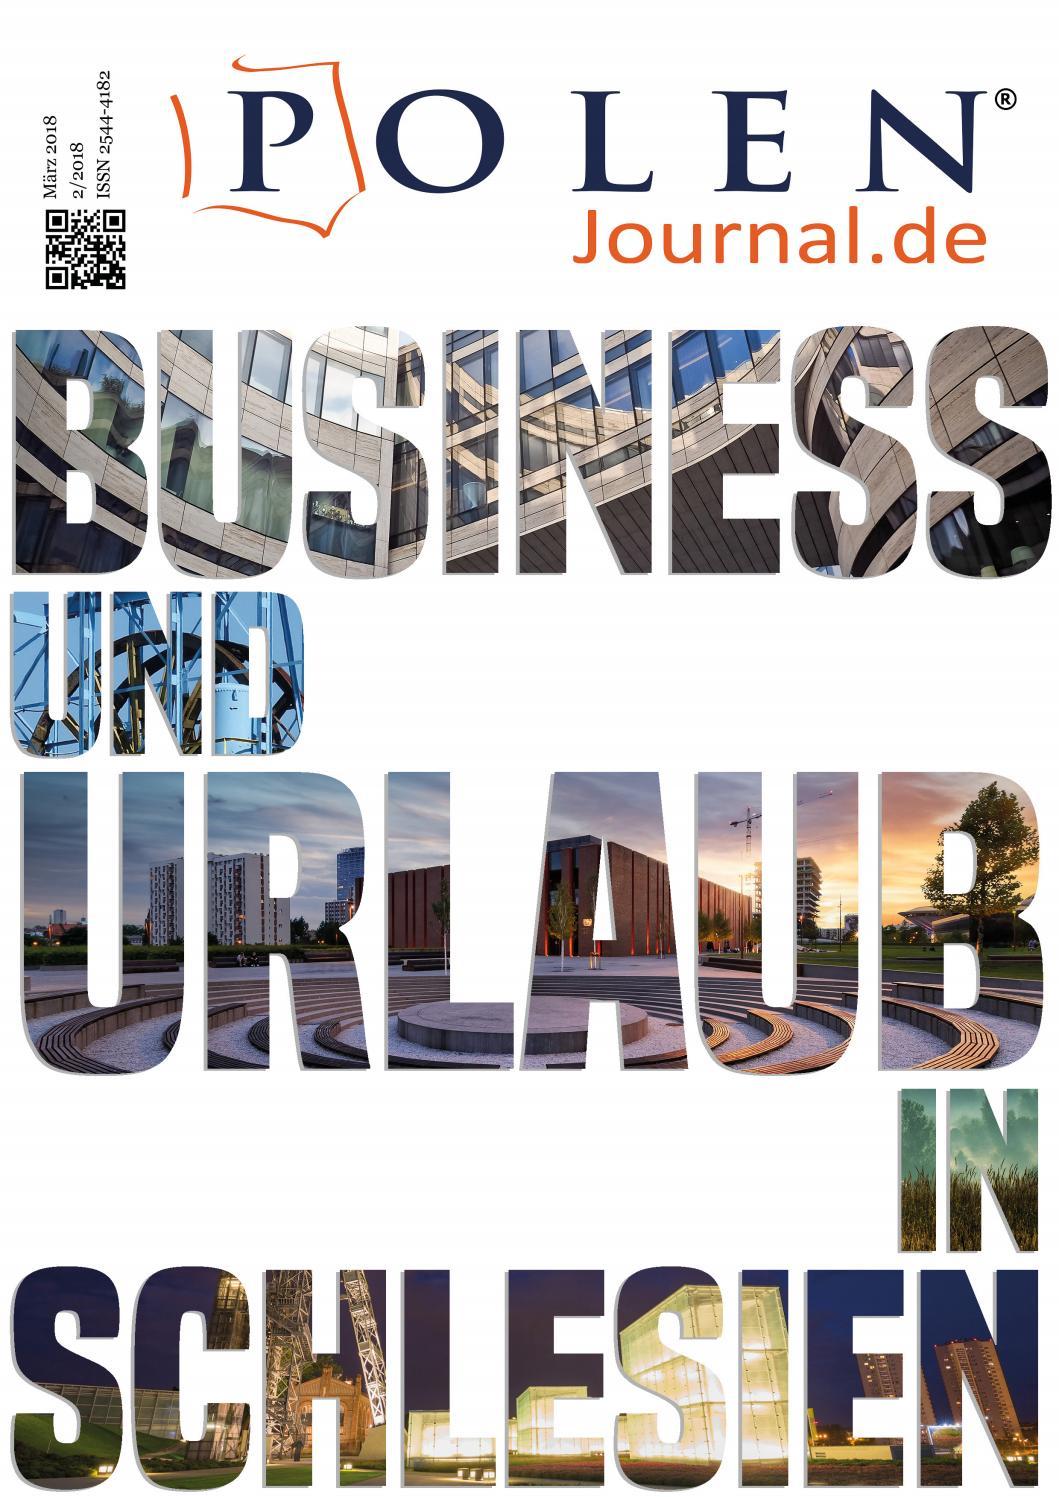 Polenjournal De 2 2018 By Sc Media Issuu